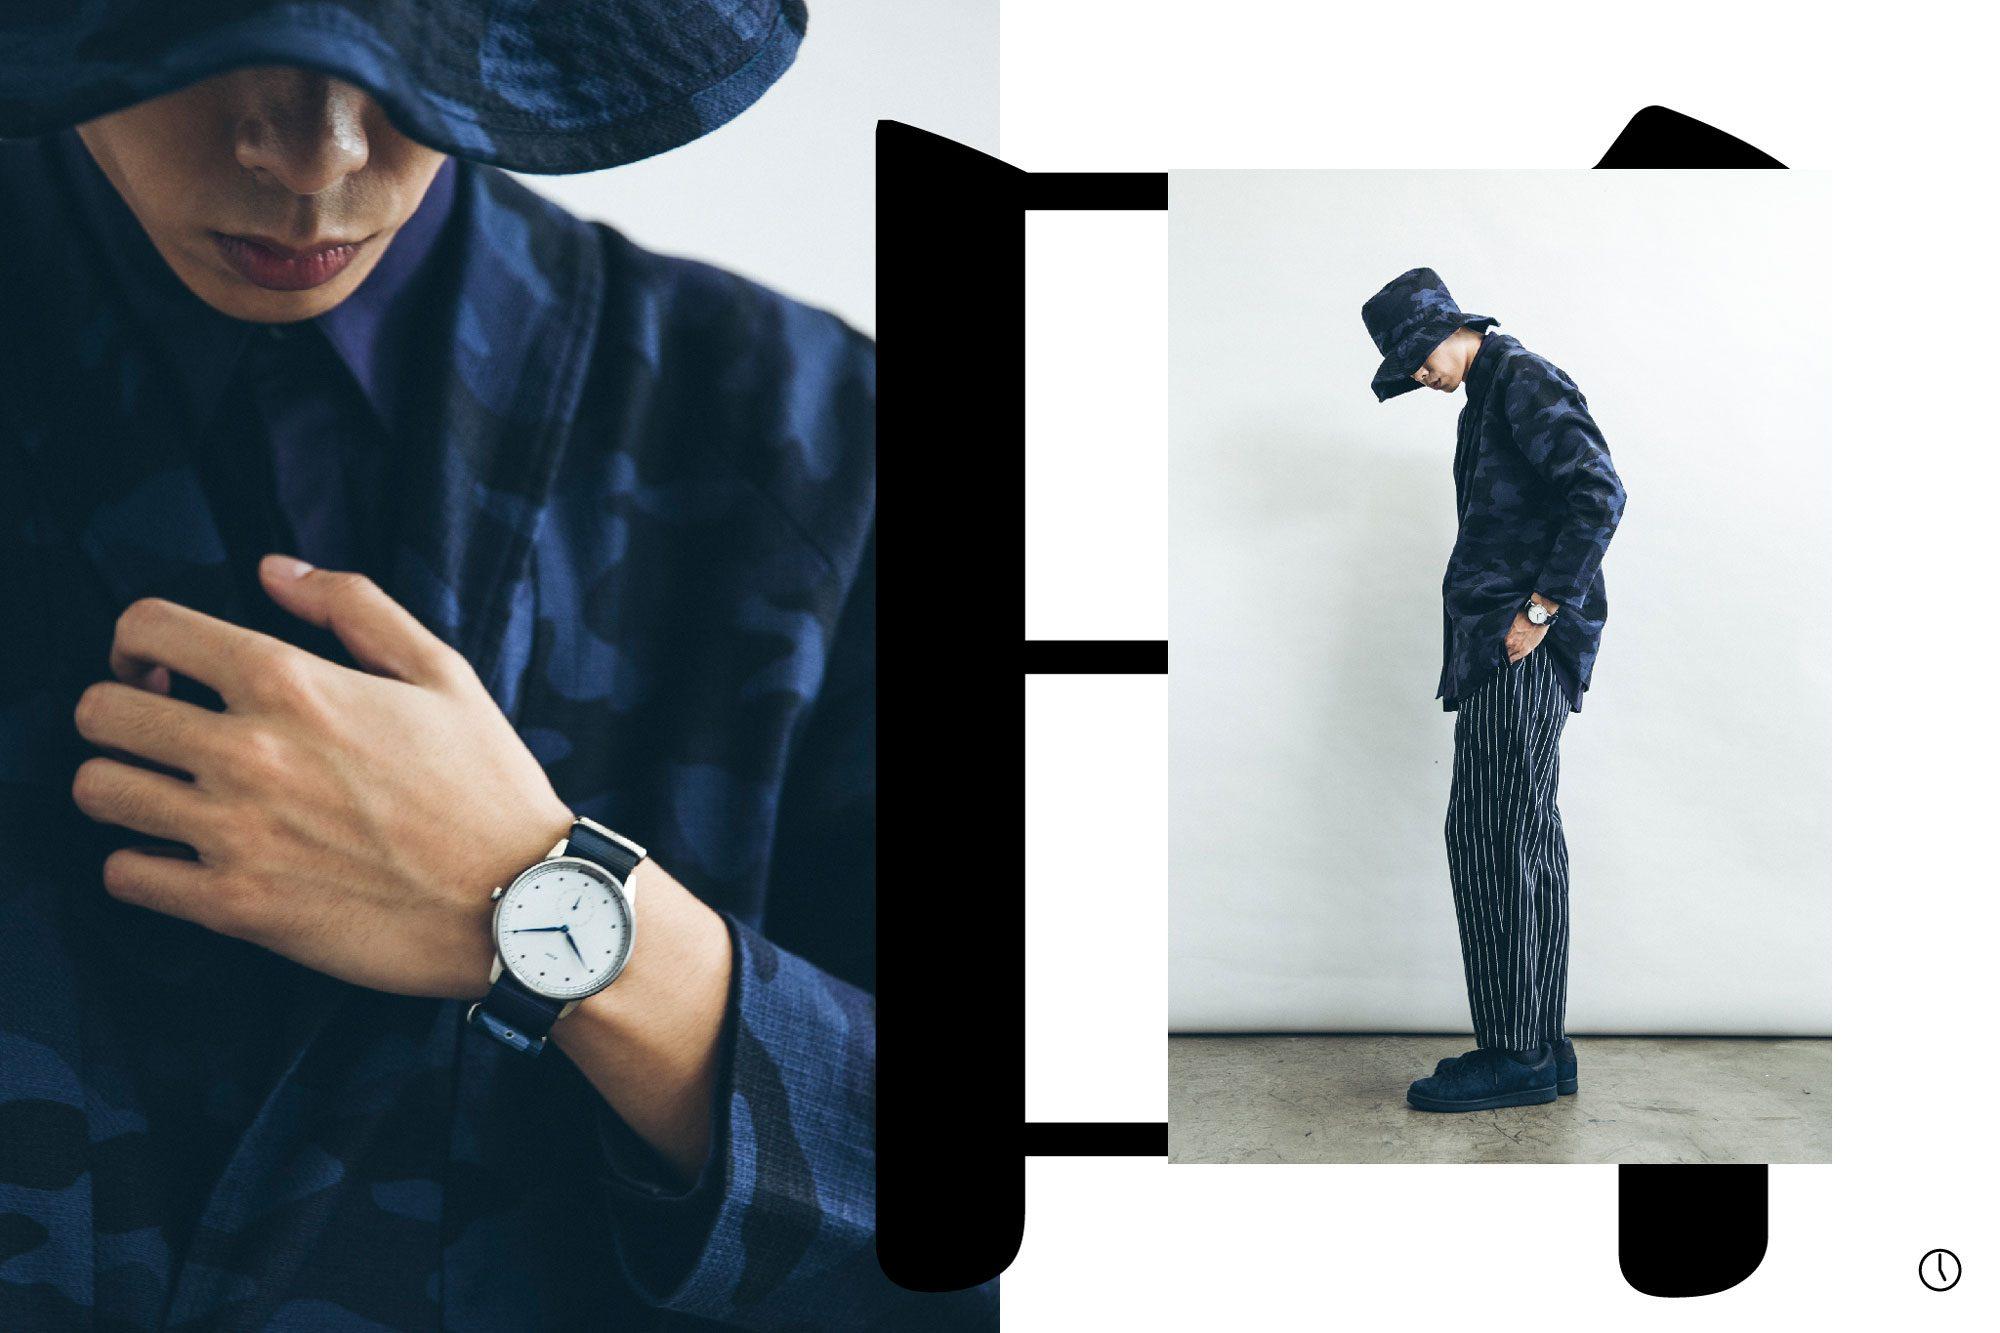 wisdom-x-hypergrand-collaboration-watch-lookbook-05